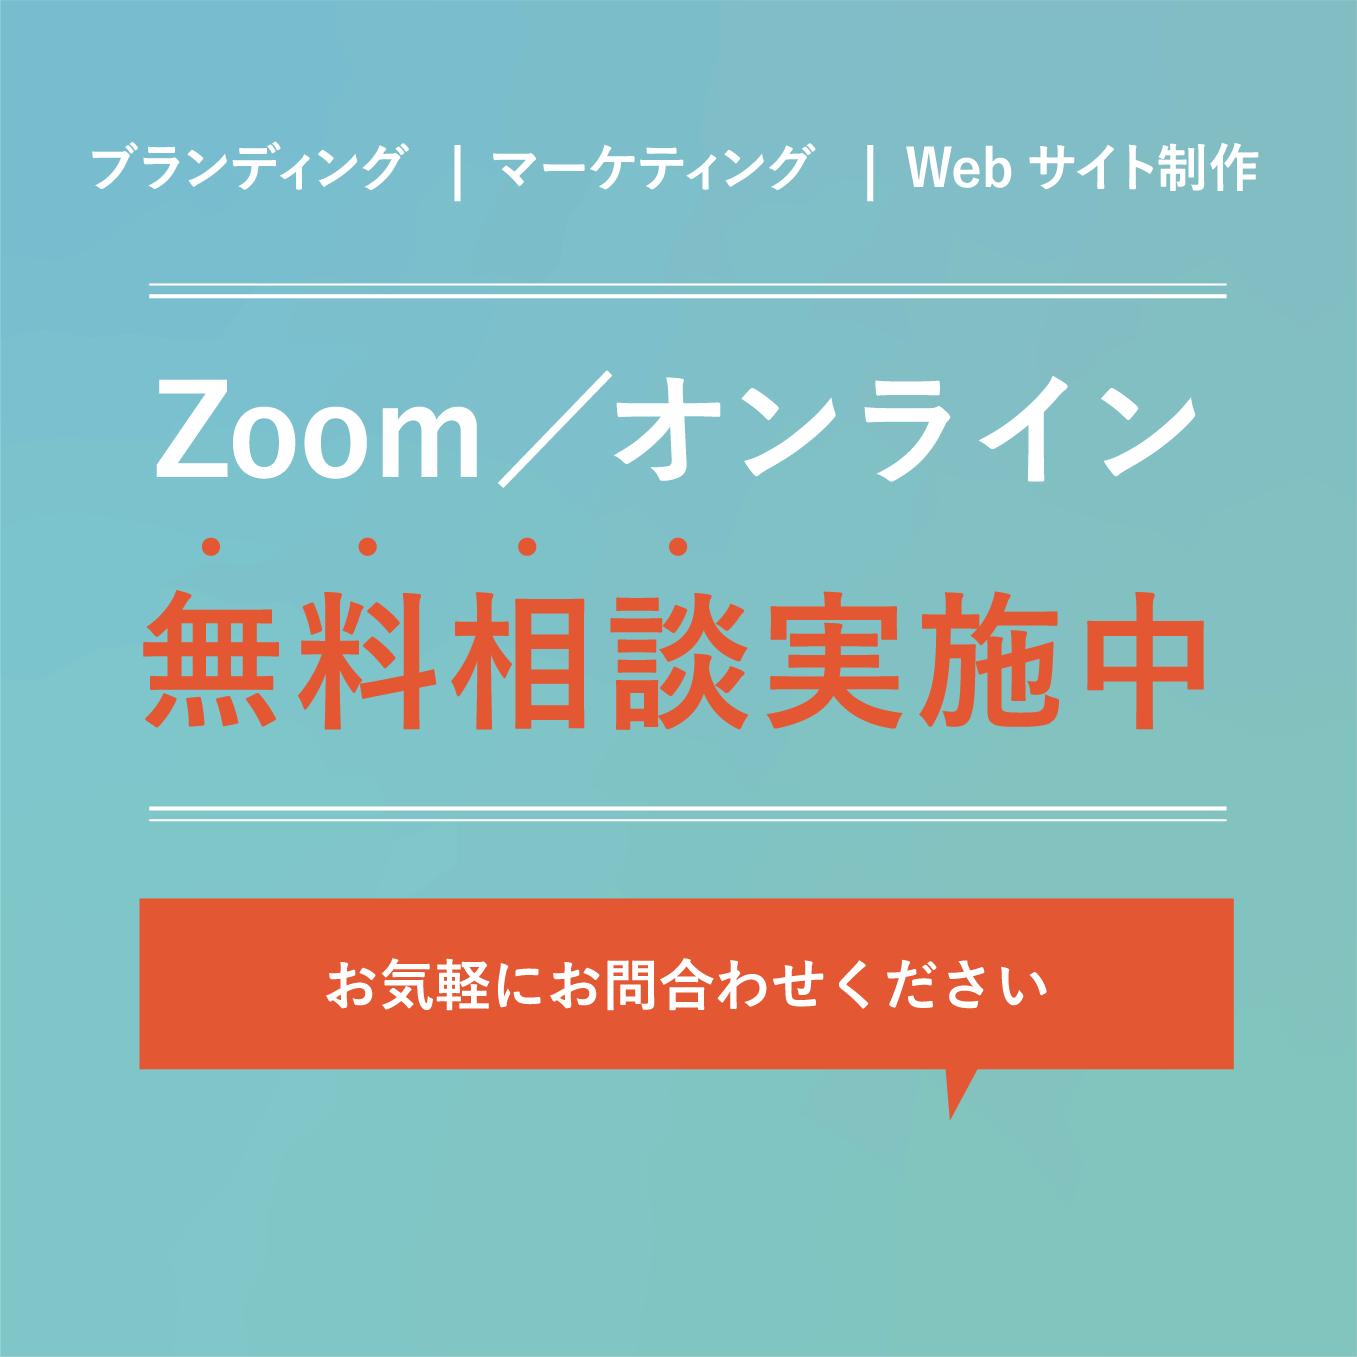 Zoom/オンライン 無料相談実施中